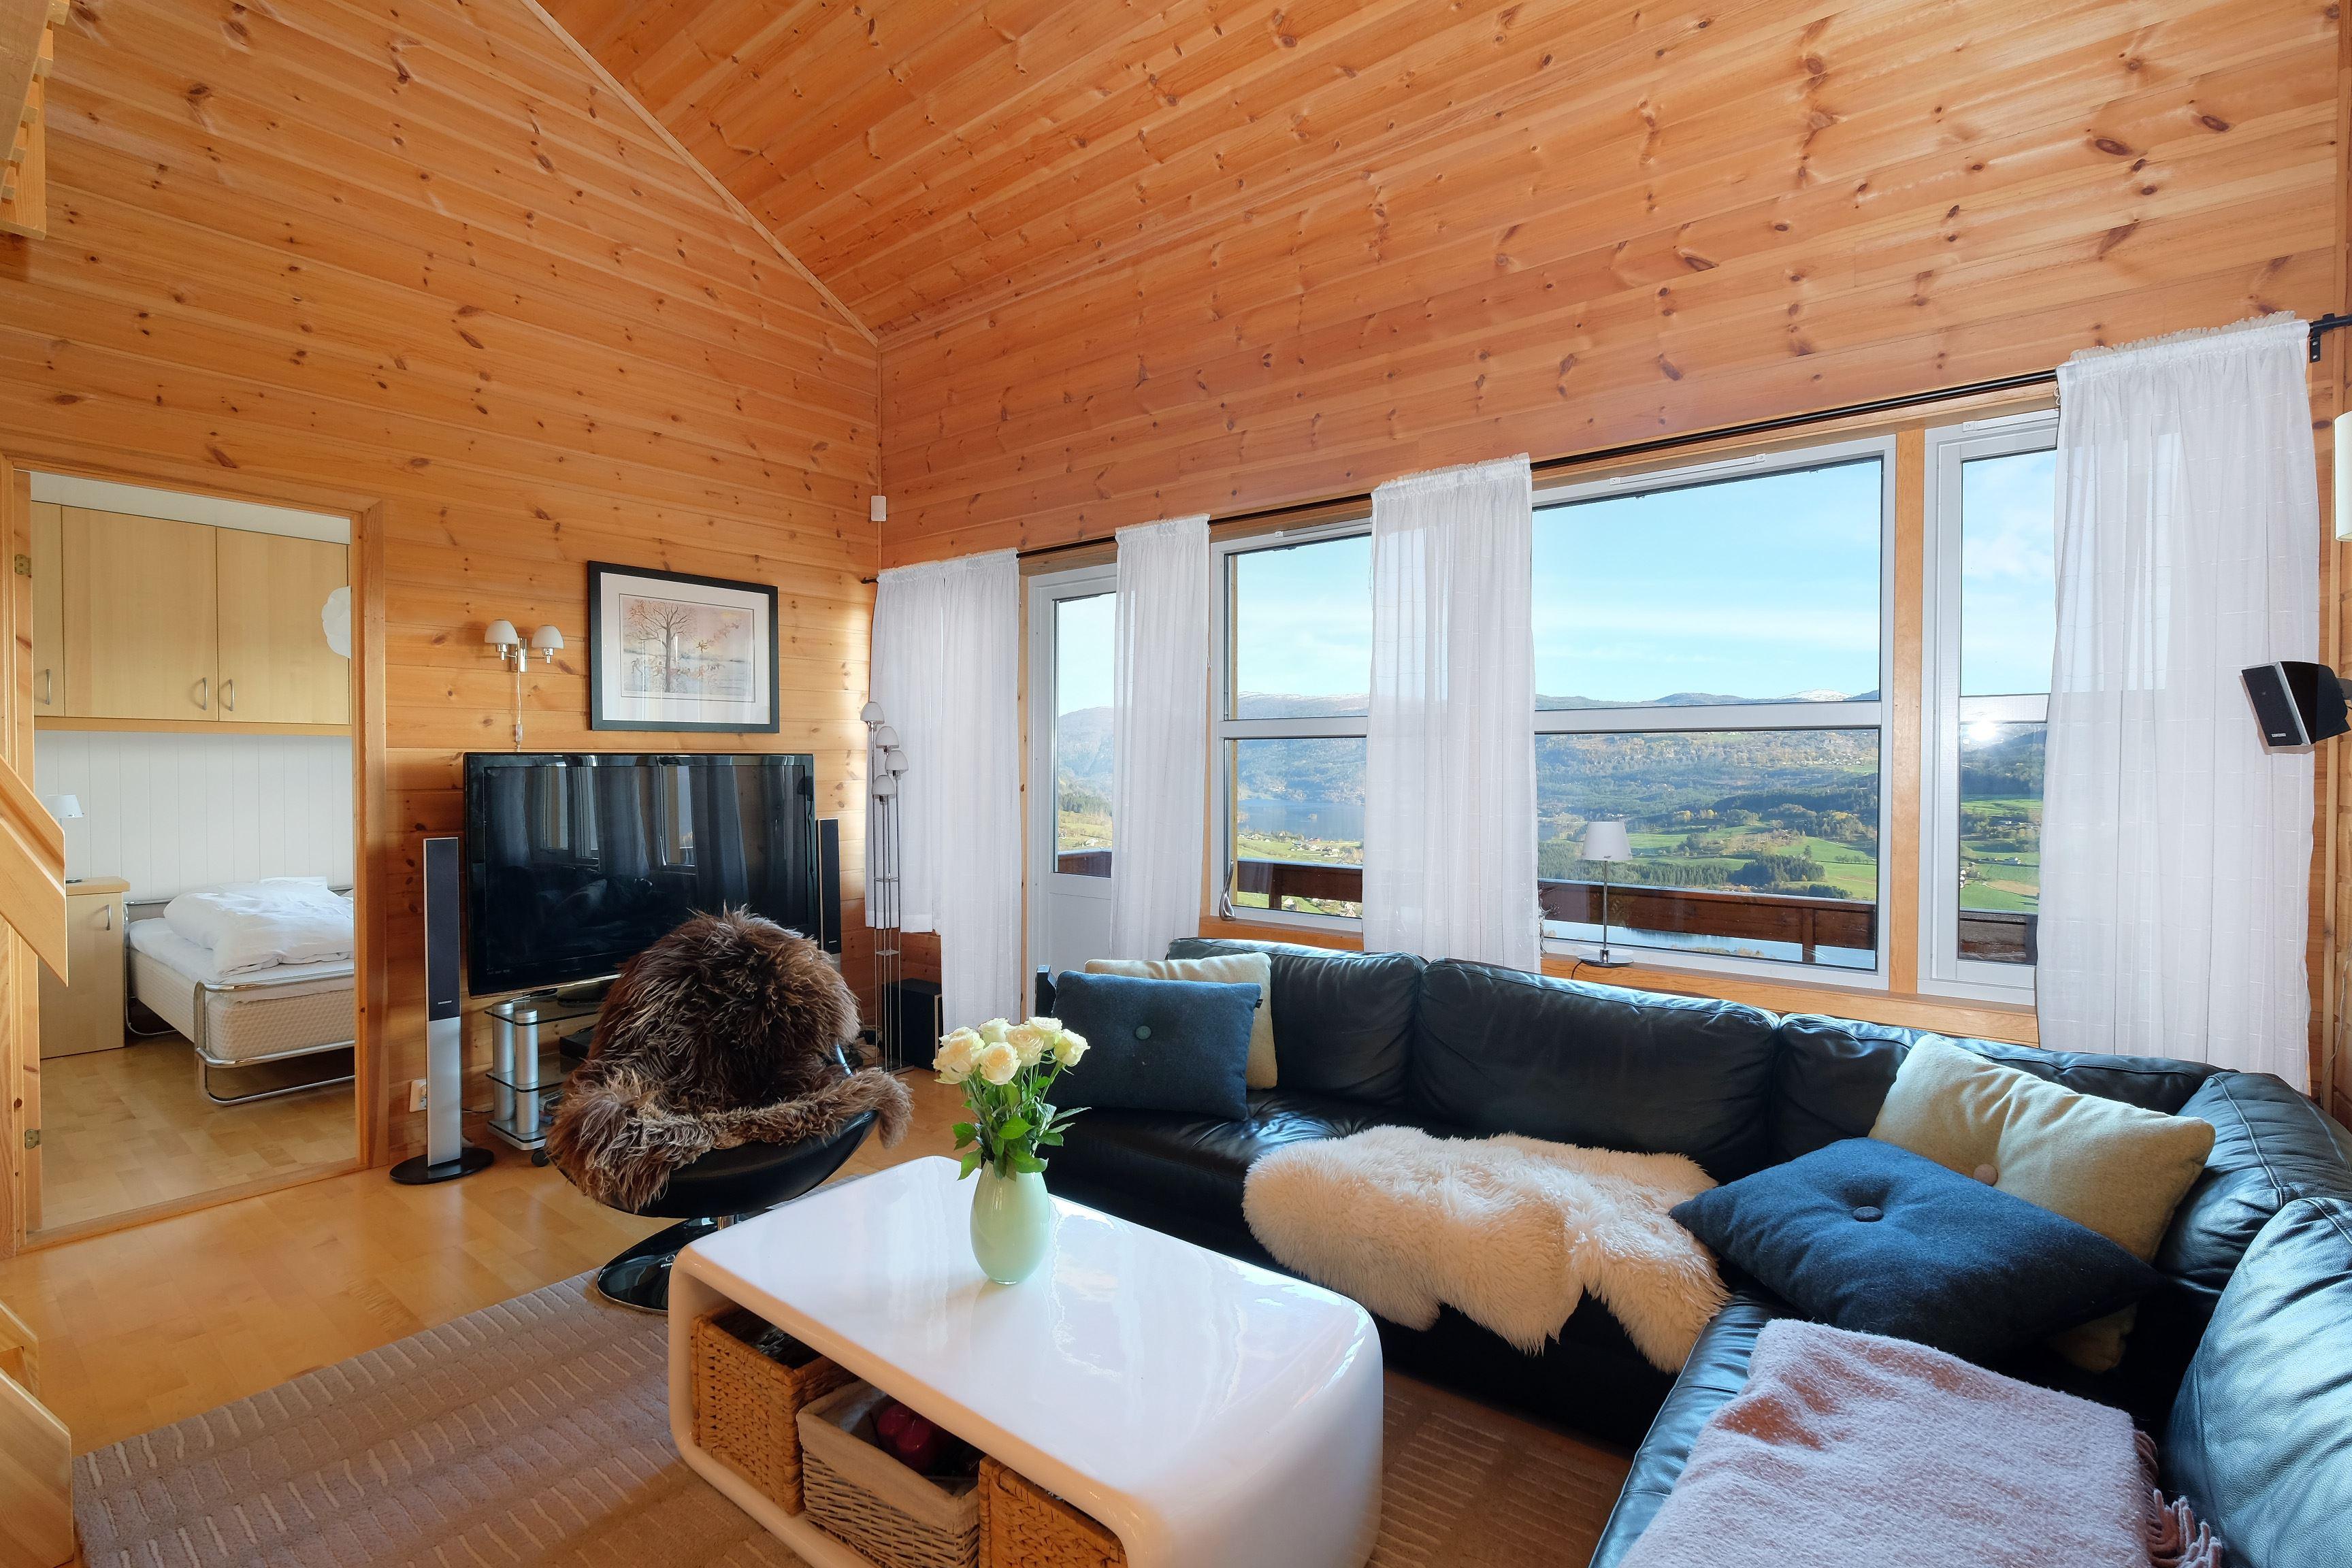 Voss Resort Bavallstunet cabins